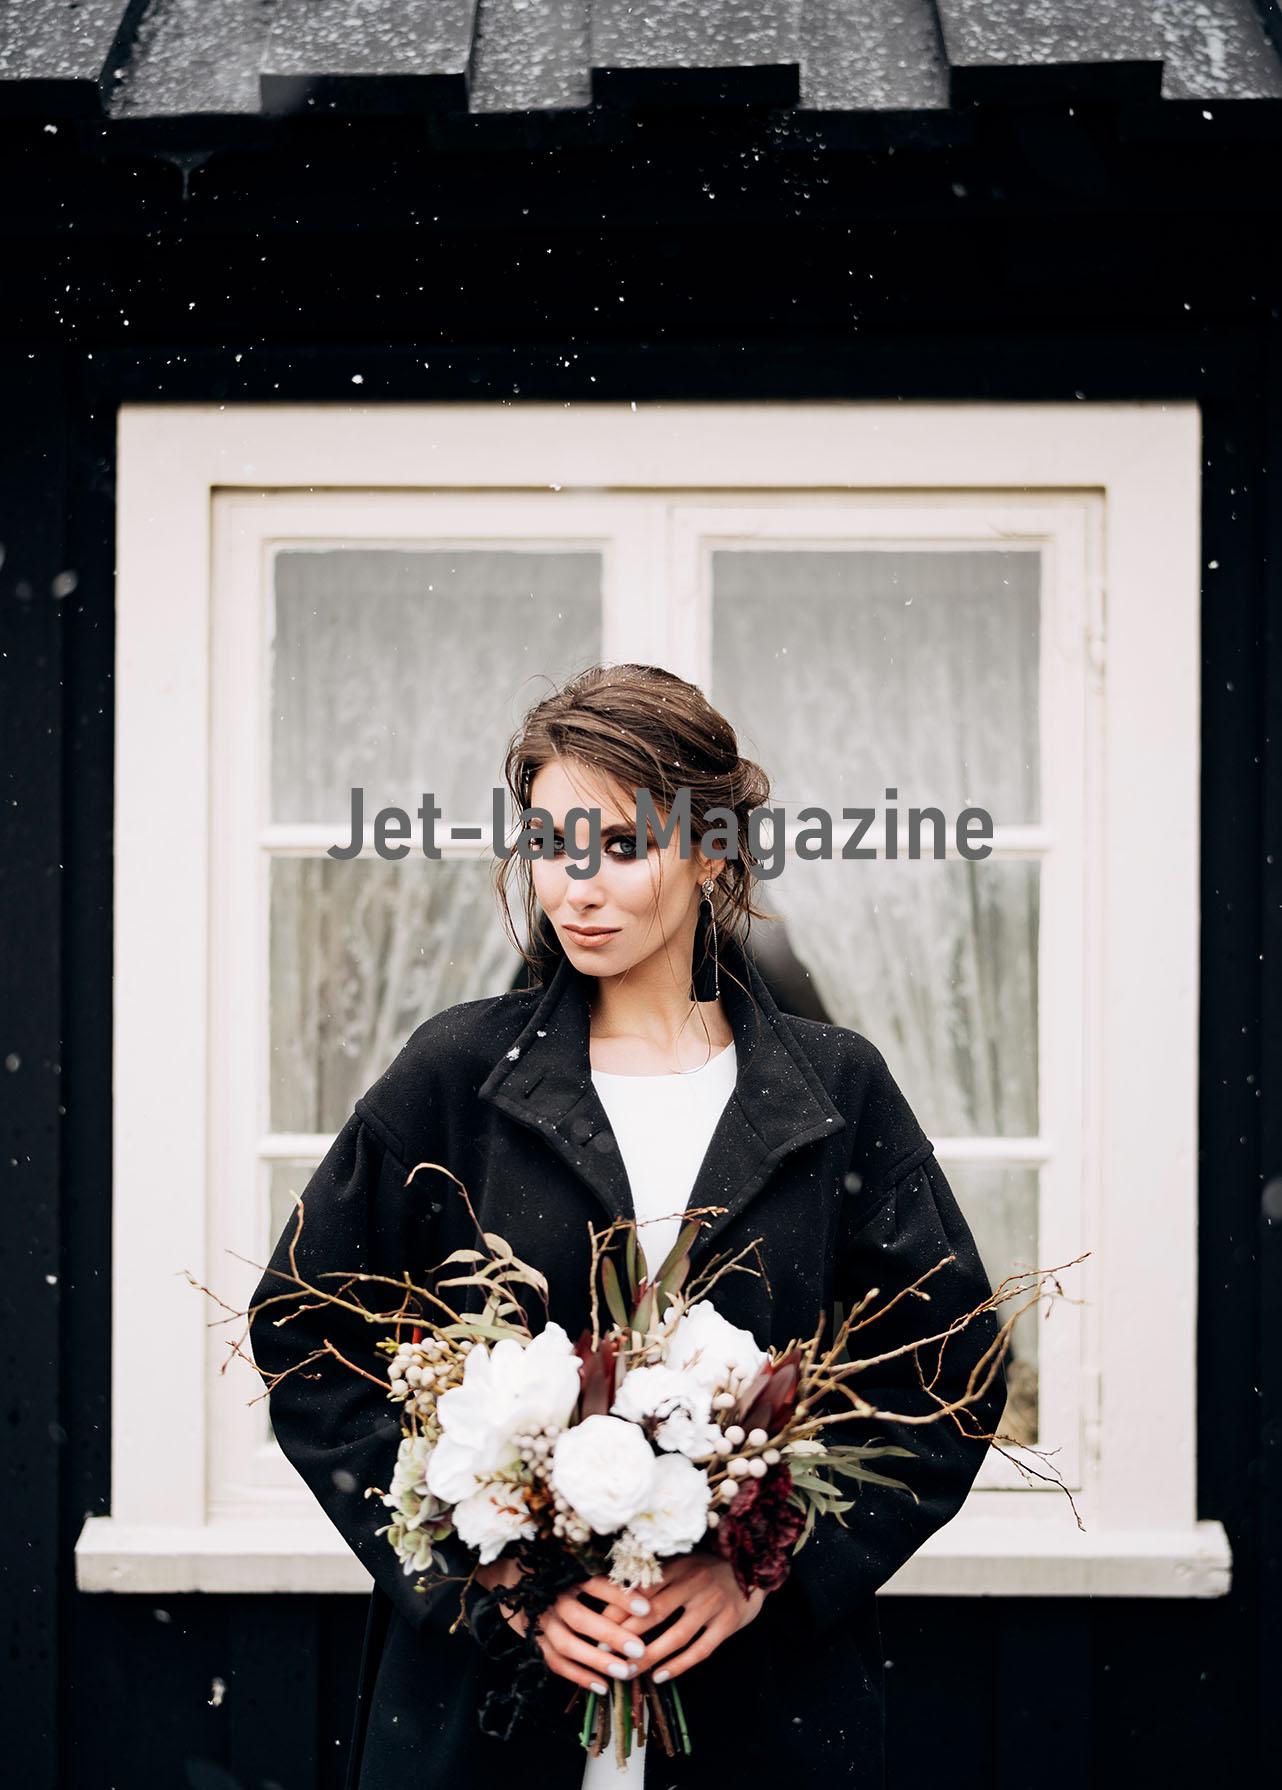 Jet-lag Magazine 19